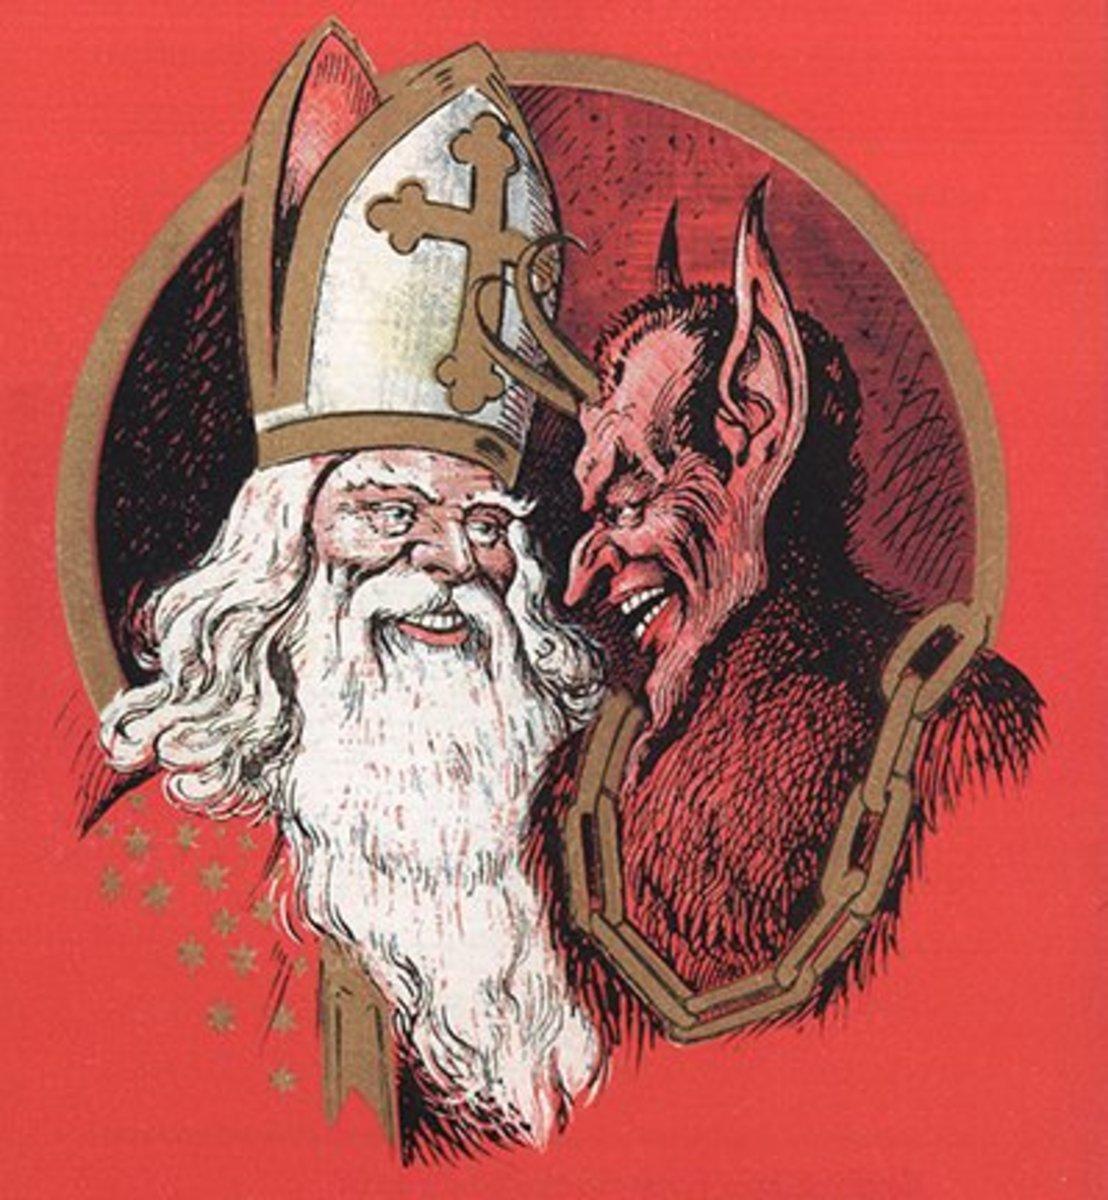 Austrian St Nicholas and Krampus c. 1900